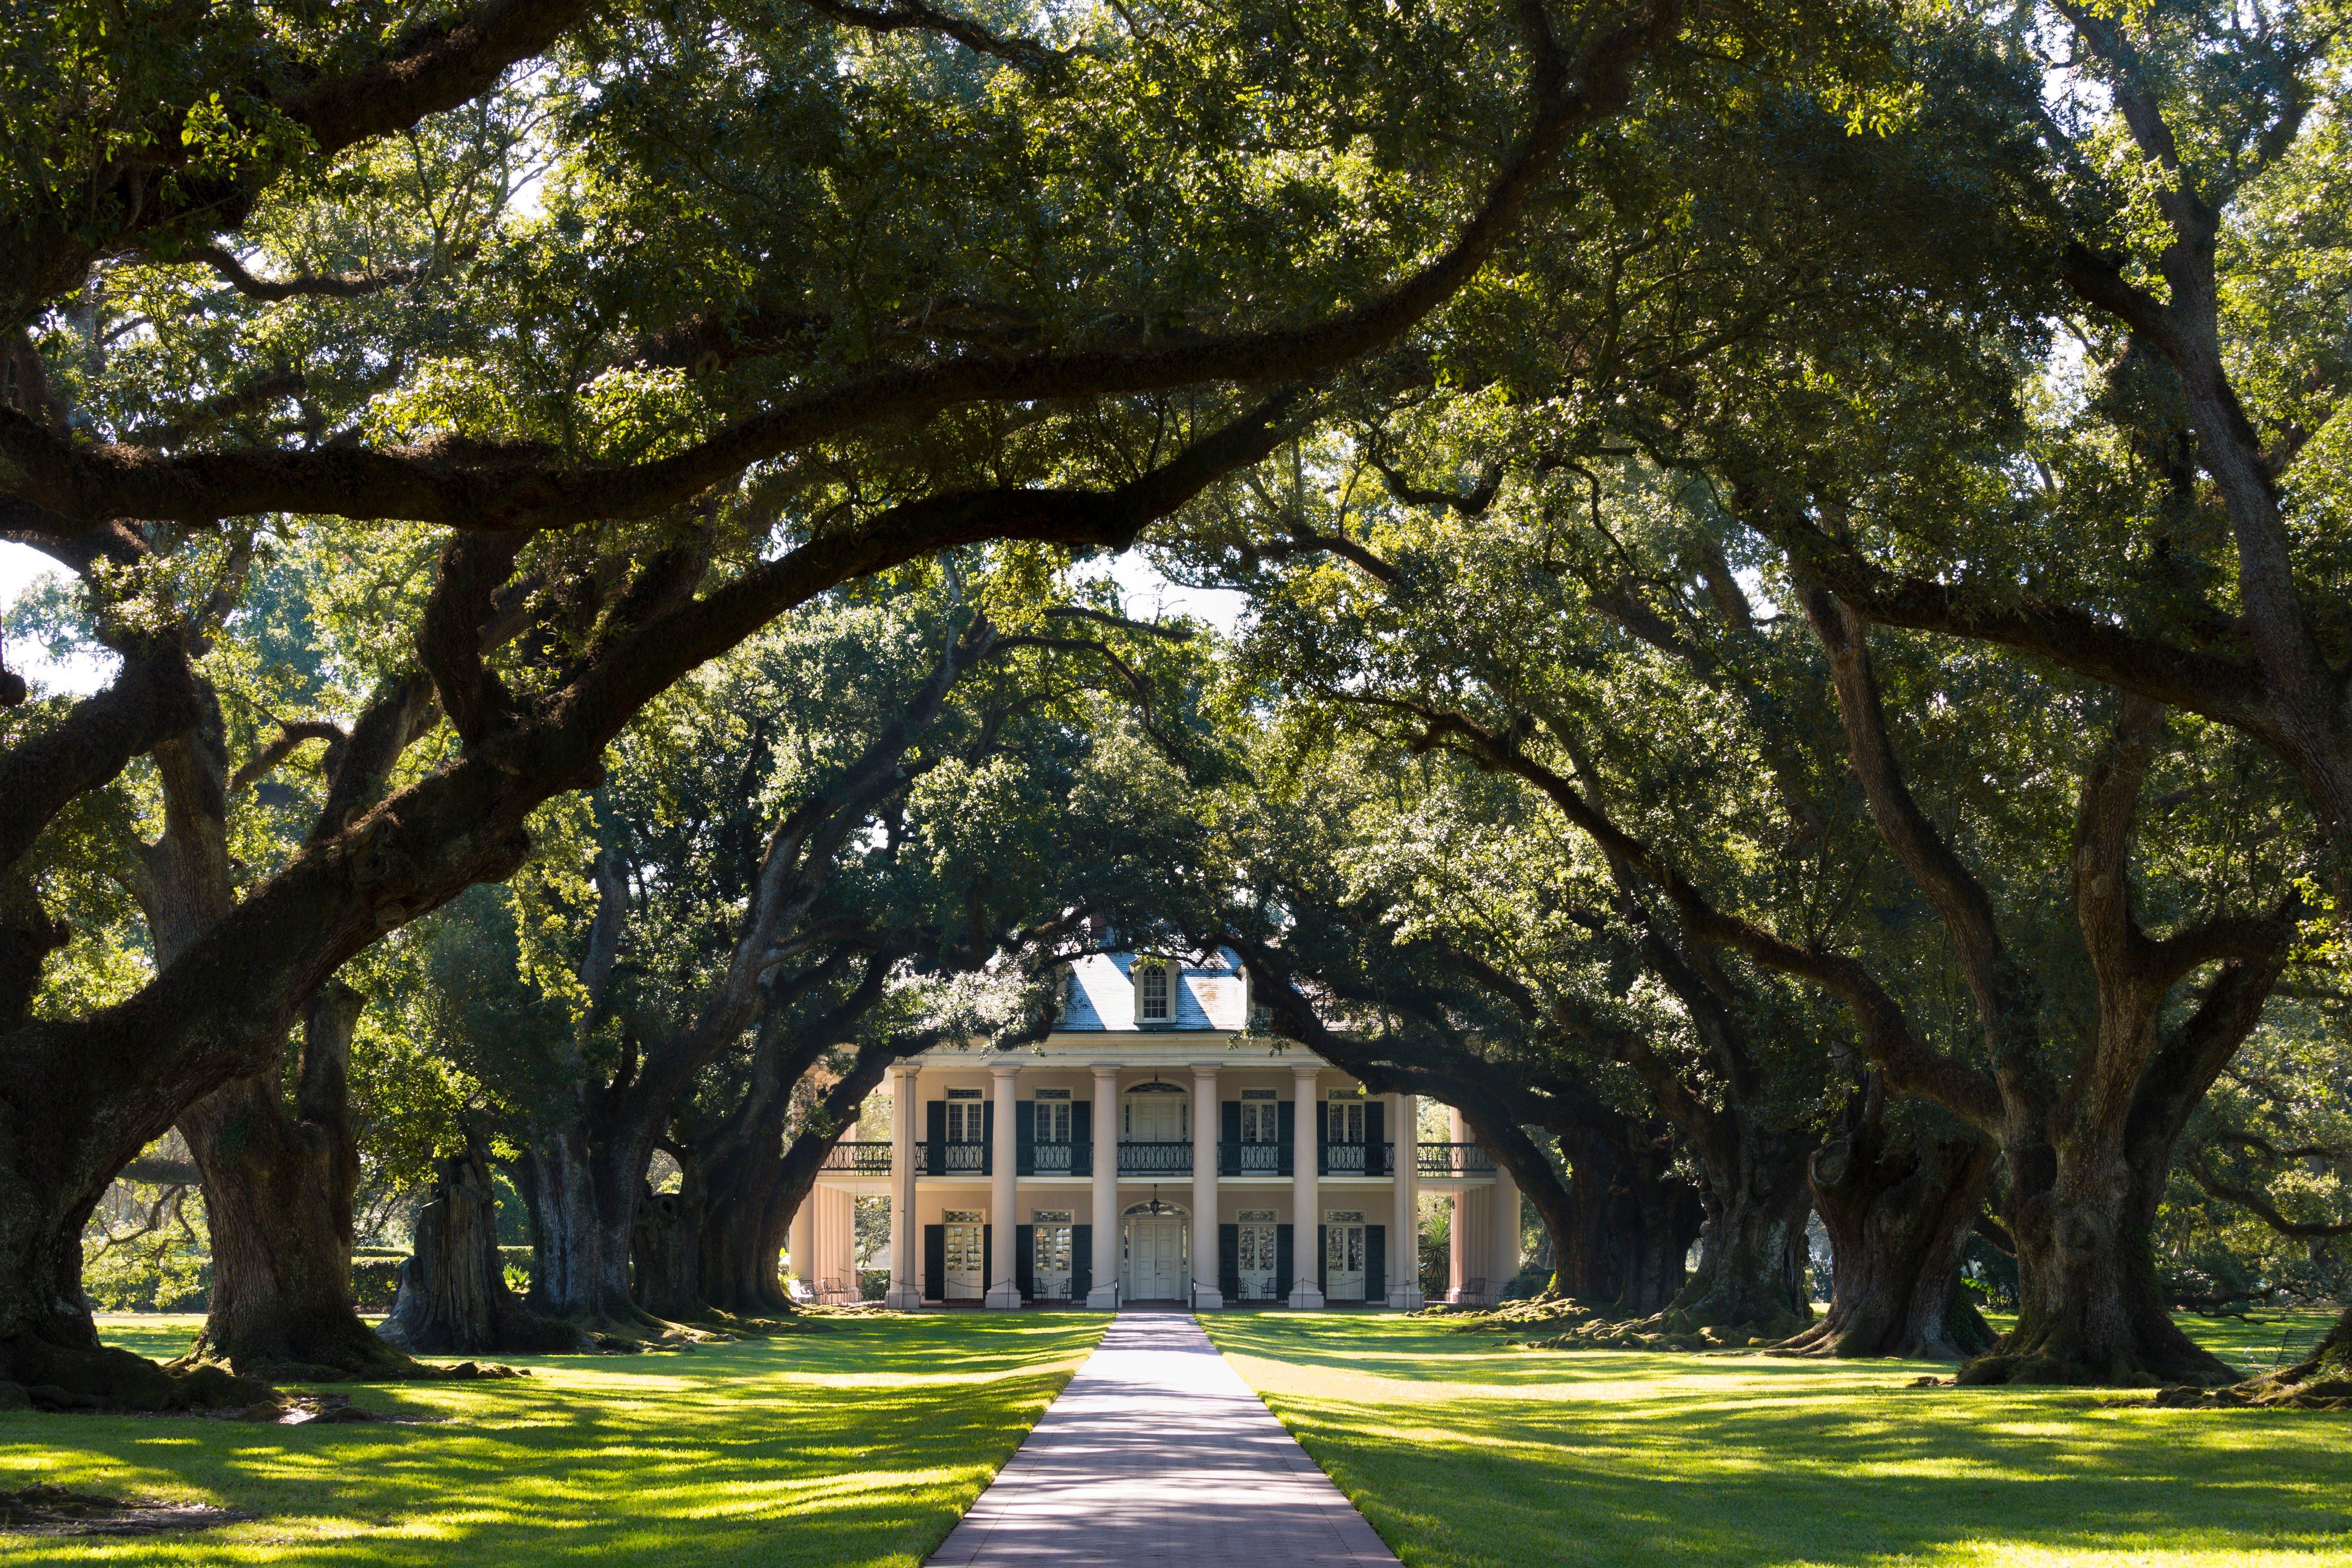 Oak Alley Plantation Antebellum Mansion, USA